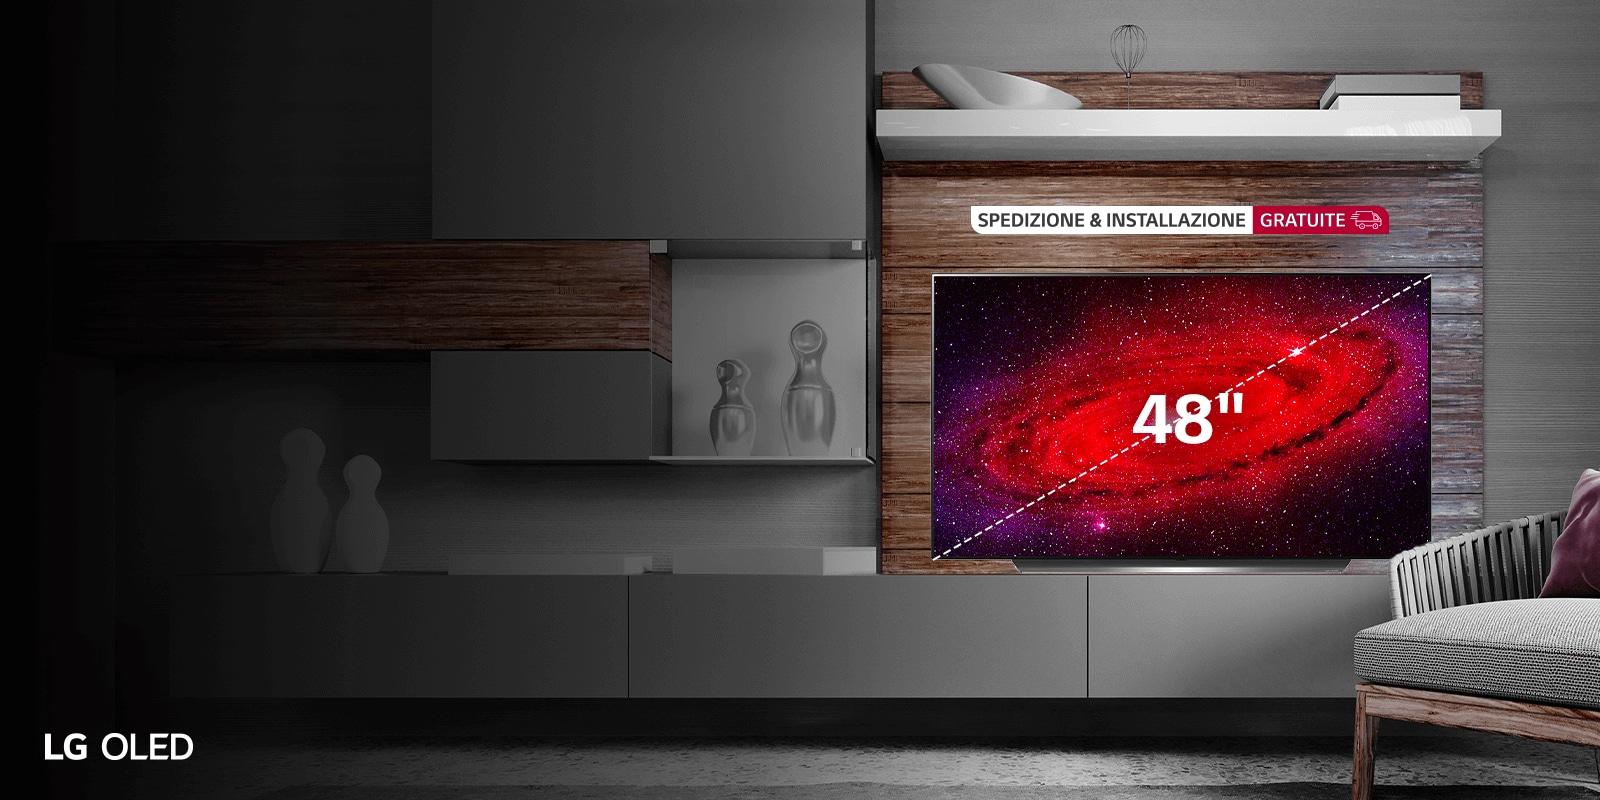 L'App Facebook Watch sulle Smart TV di LG